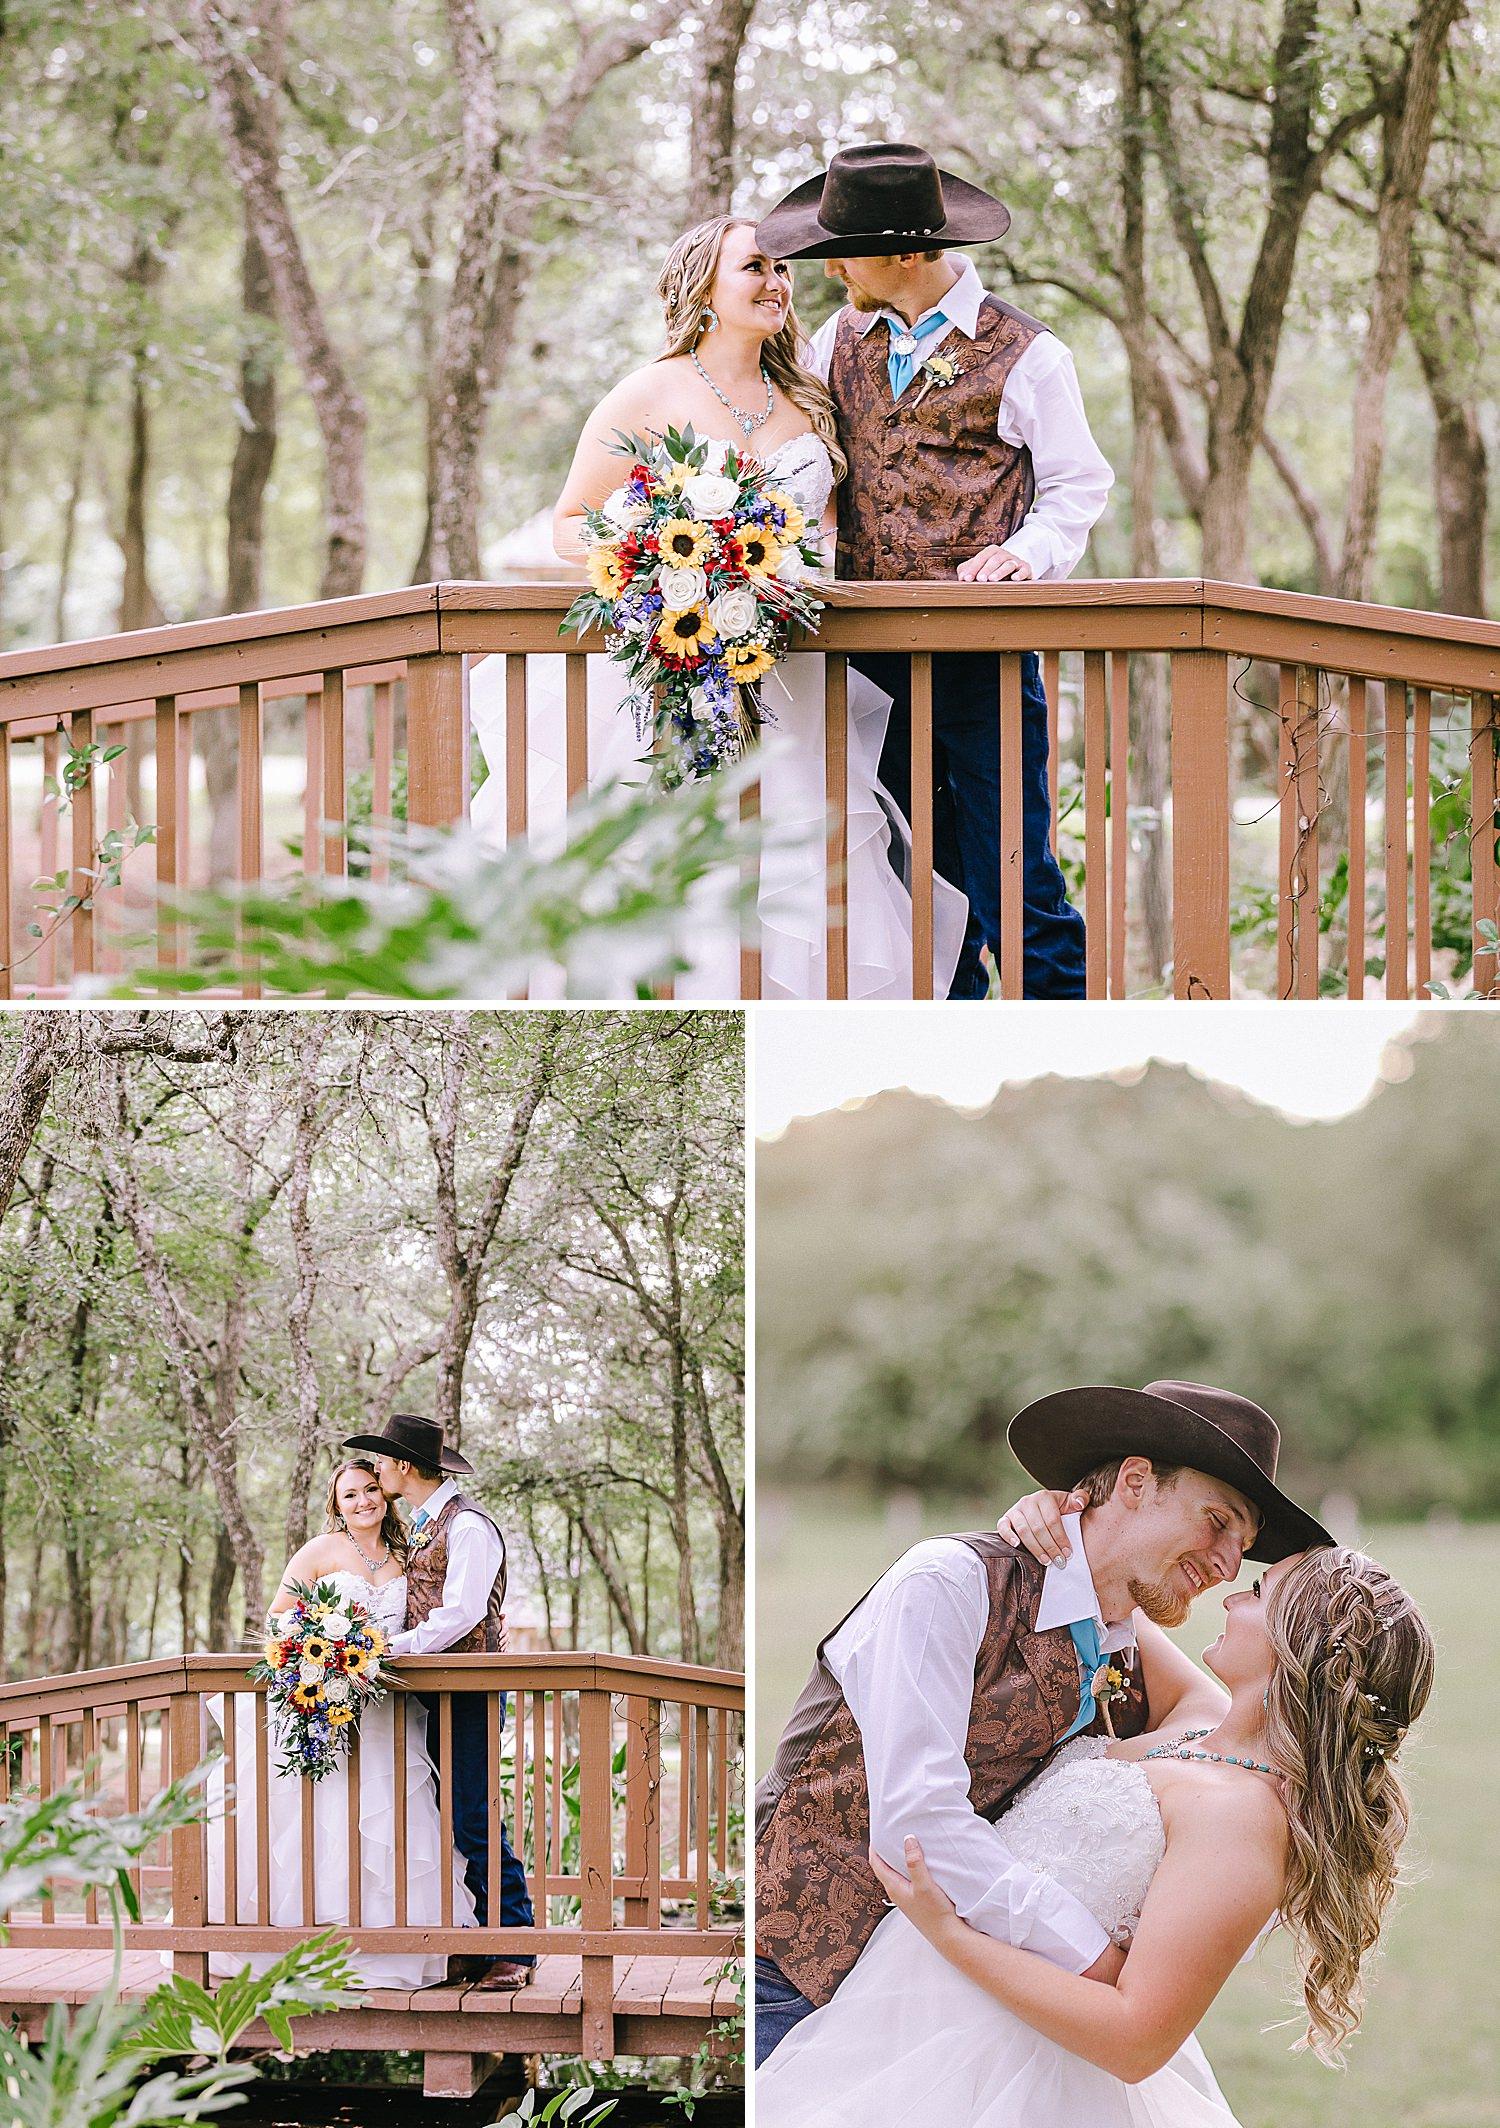 Carly-Barton-Photography-Old-Town-Texas-Rustic-Wedding-Photos-Sunflowers-Boots-Kyle-Texas_0065.jpg